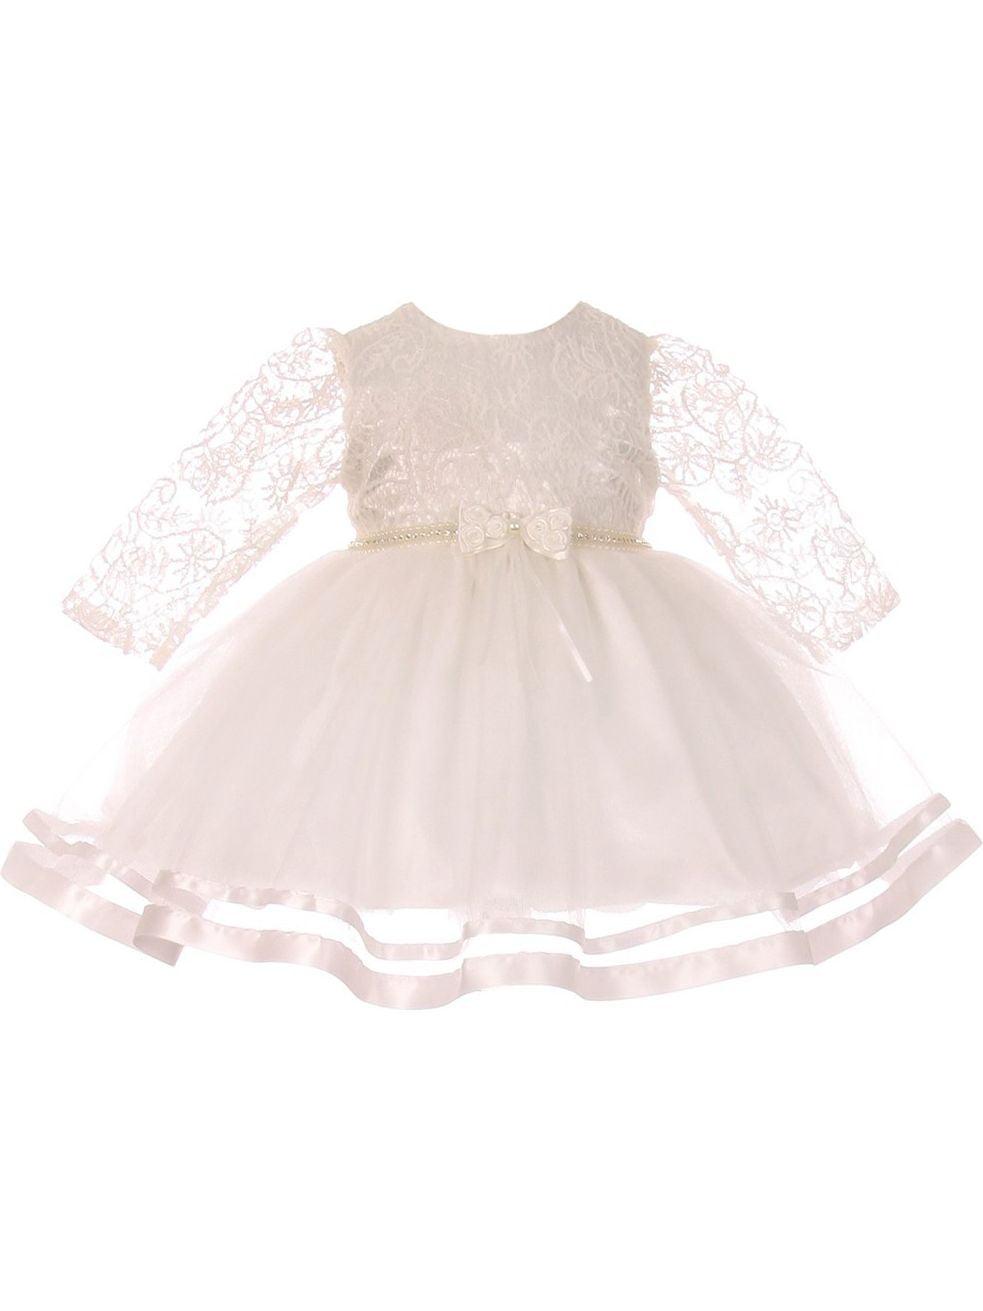 Baby Girls Ivory Lace Tulle Rhinestone Pearl Flower Girls Dress S-XL